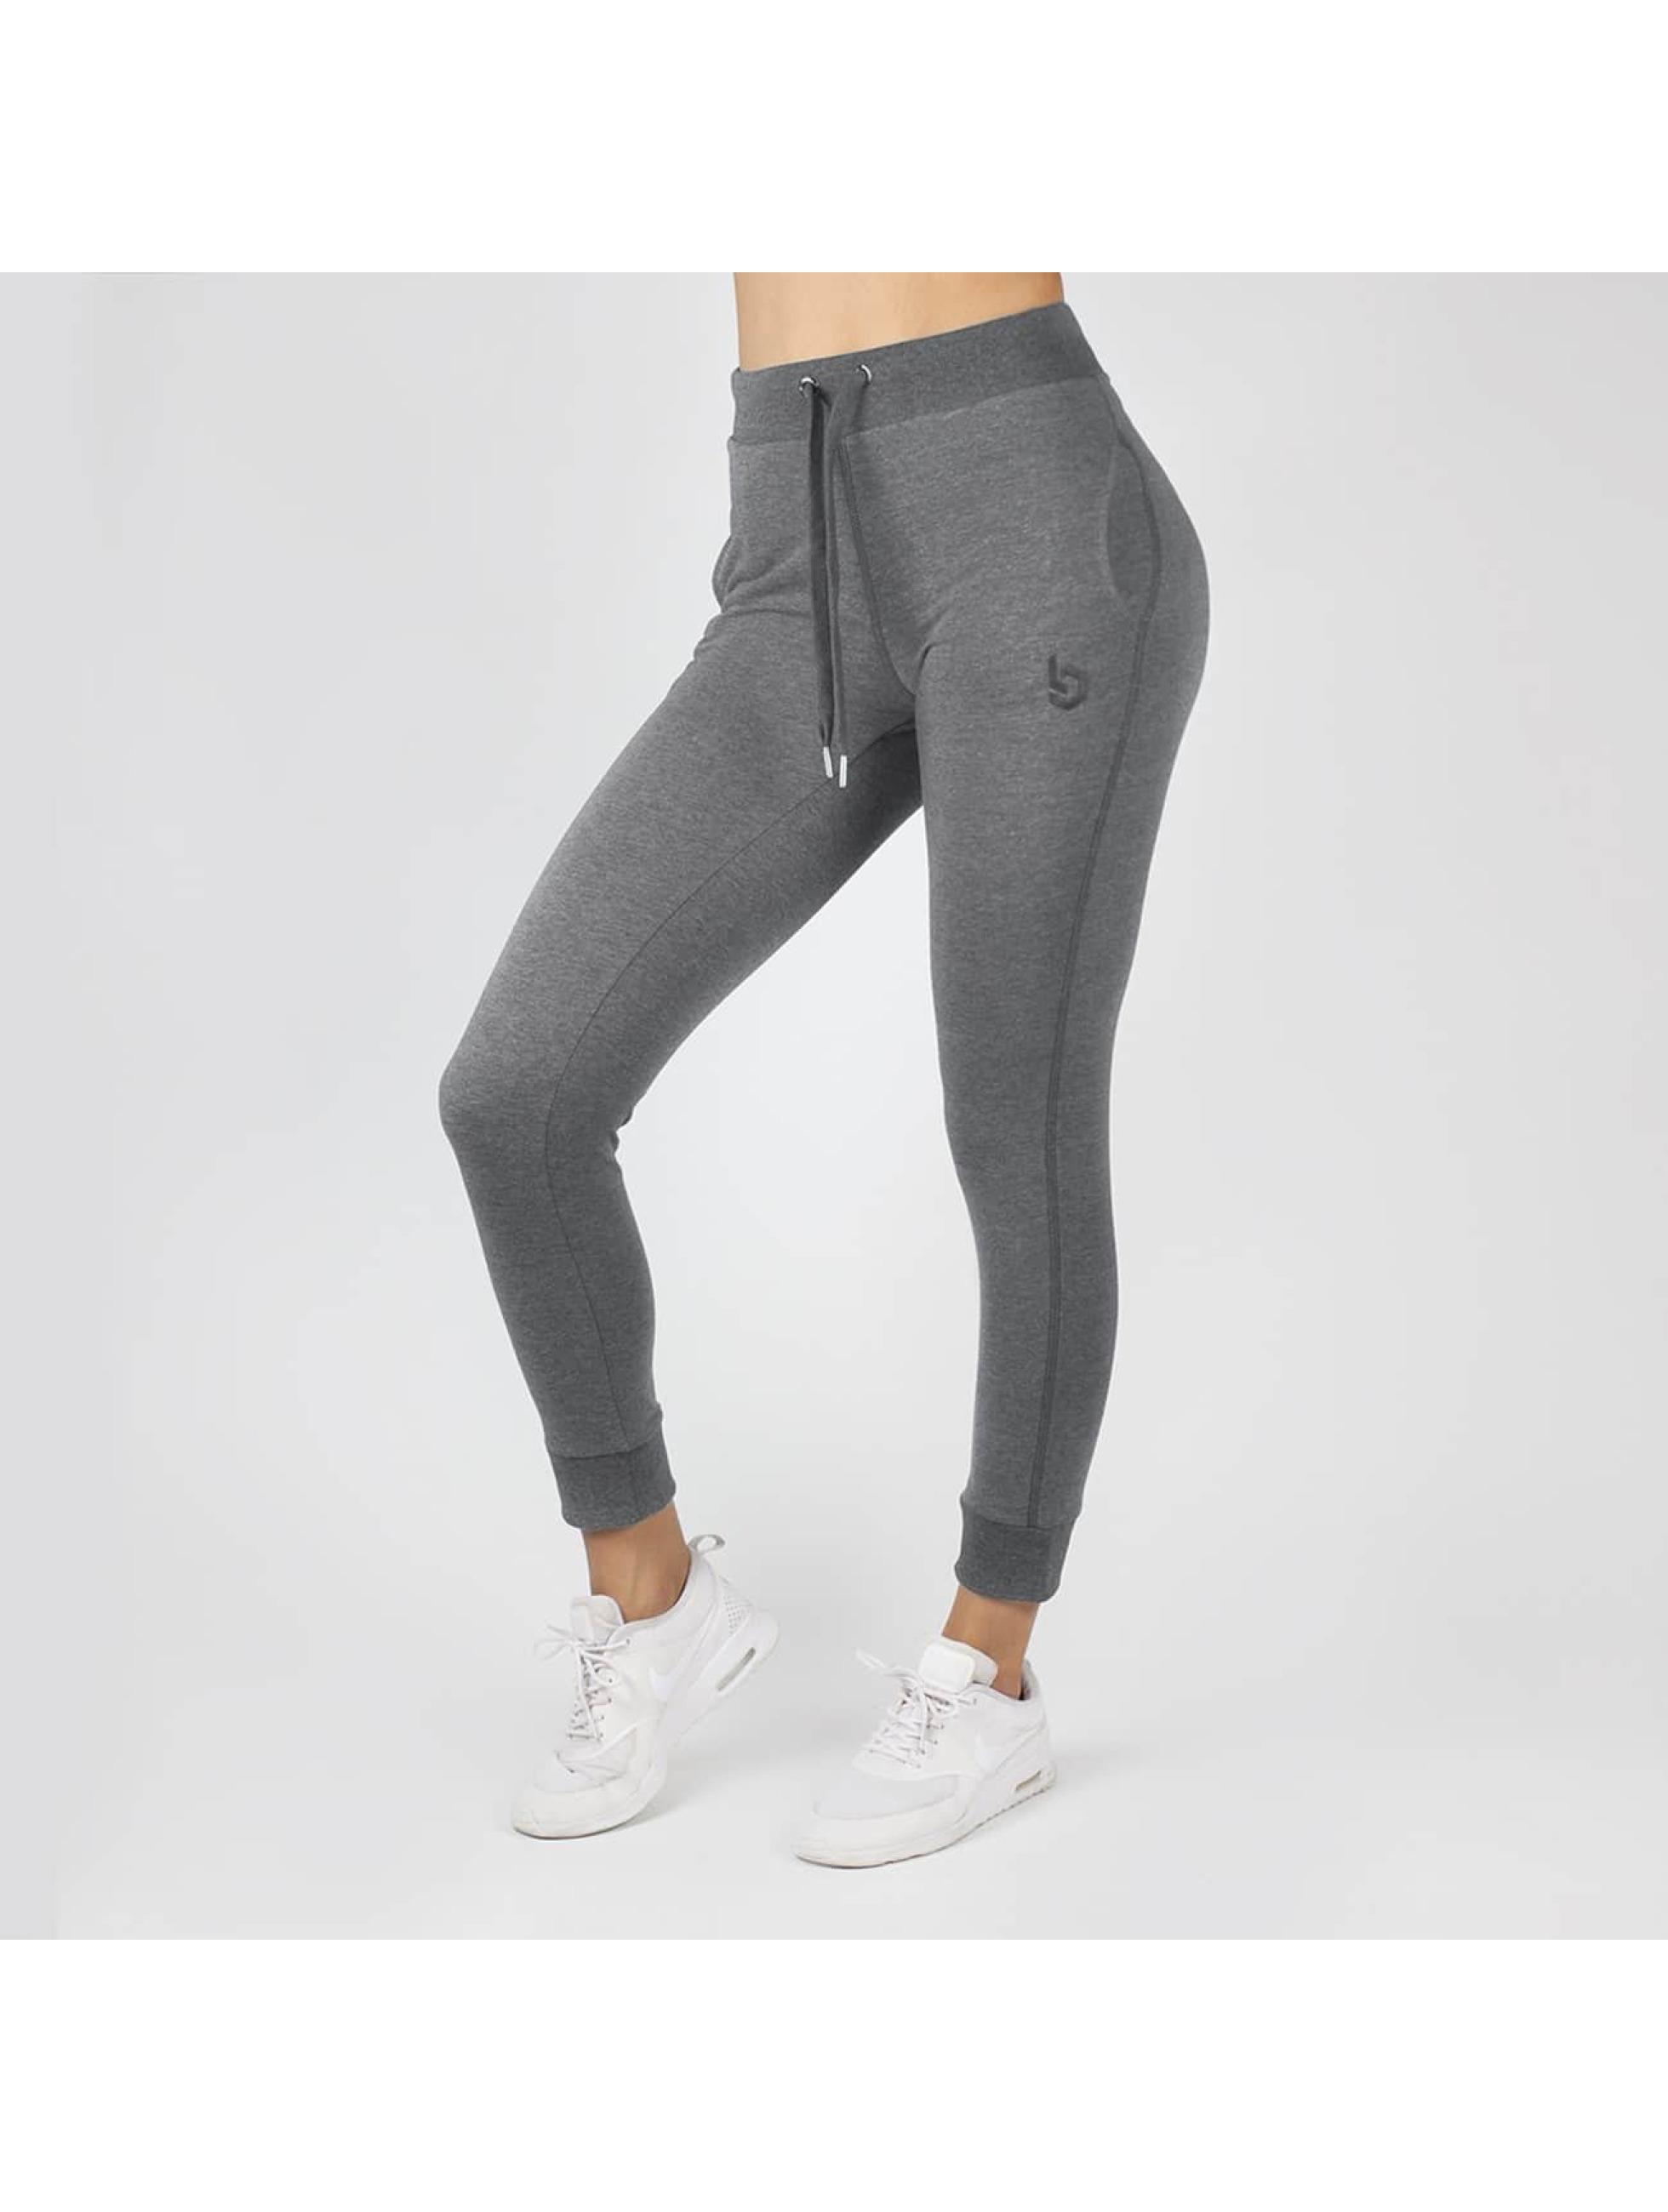 Beyond Limits Leggings/Treggings Motion gray